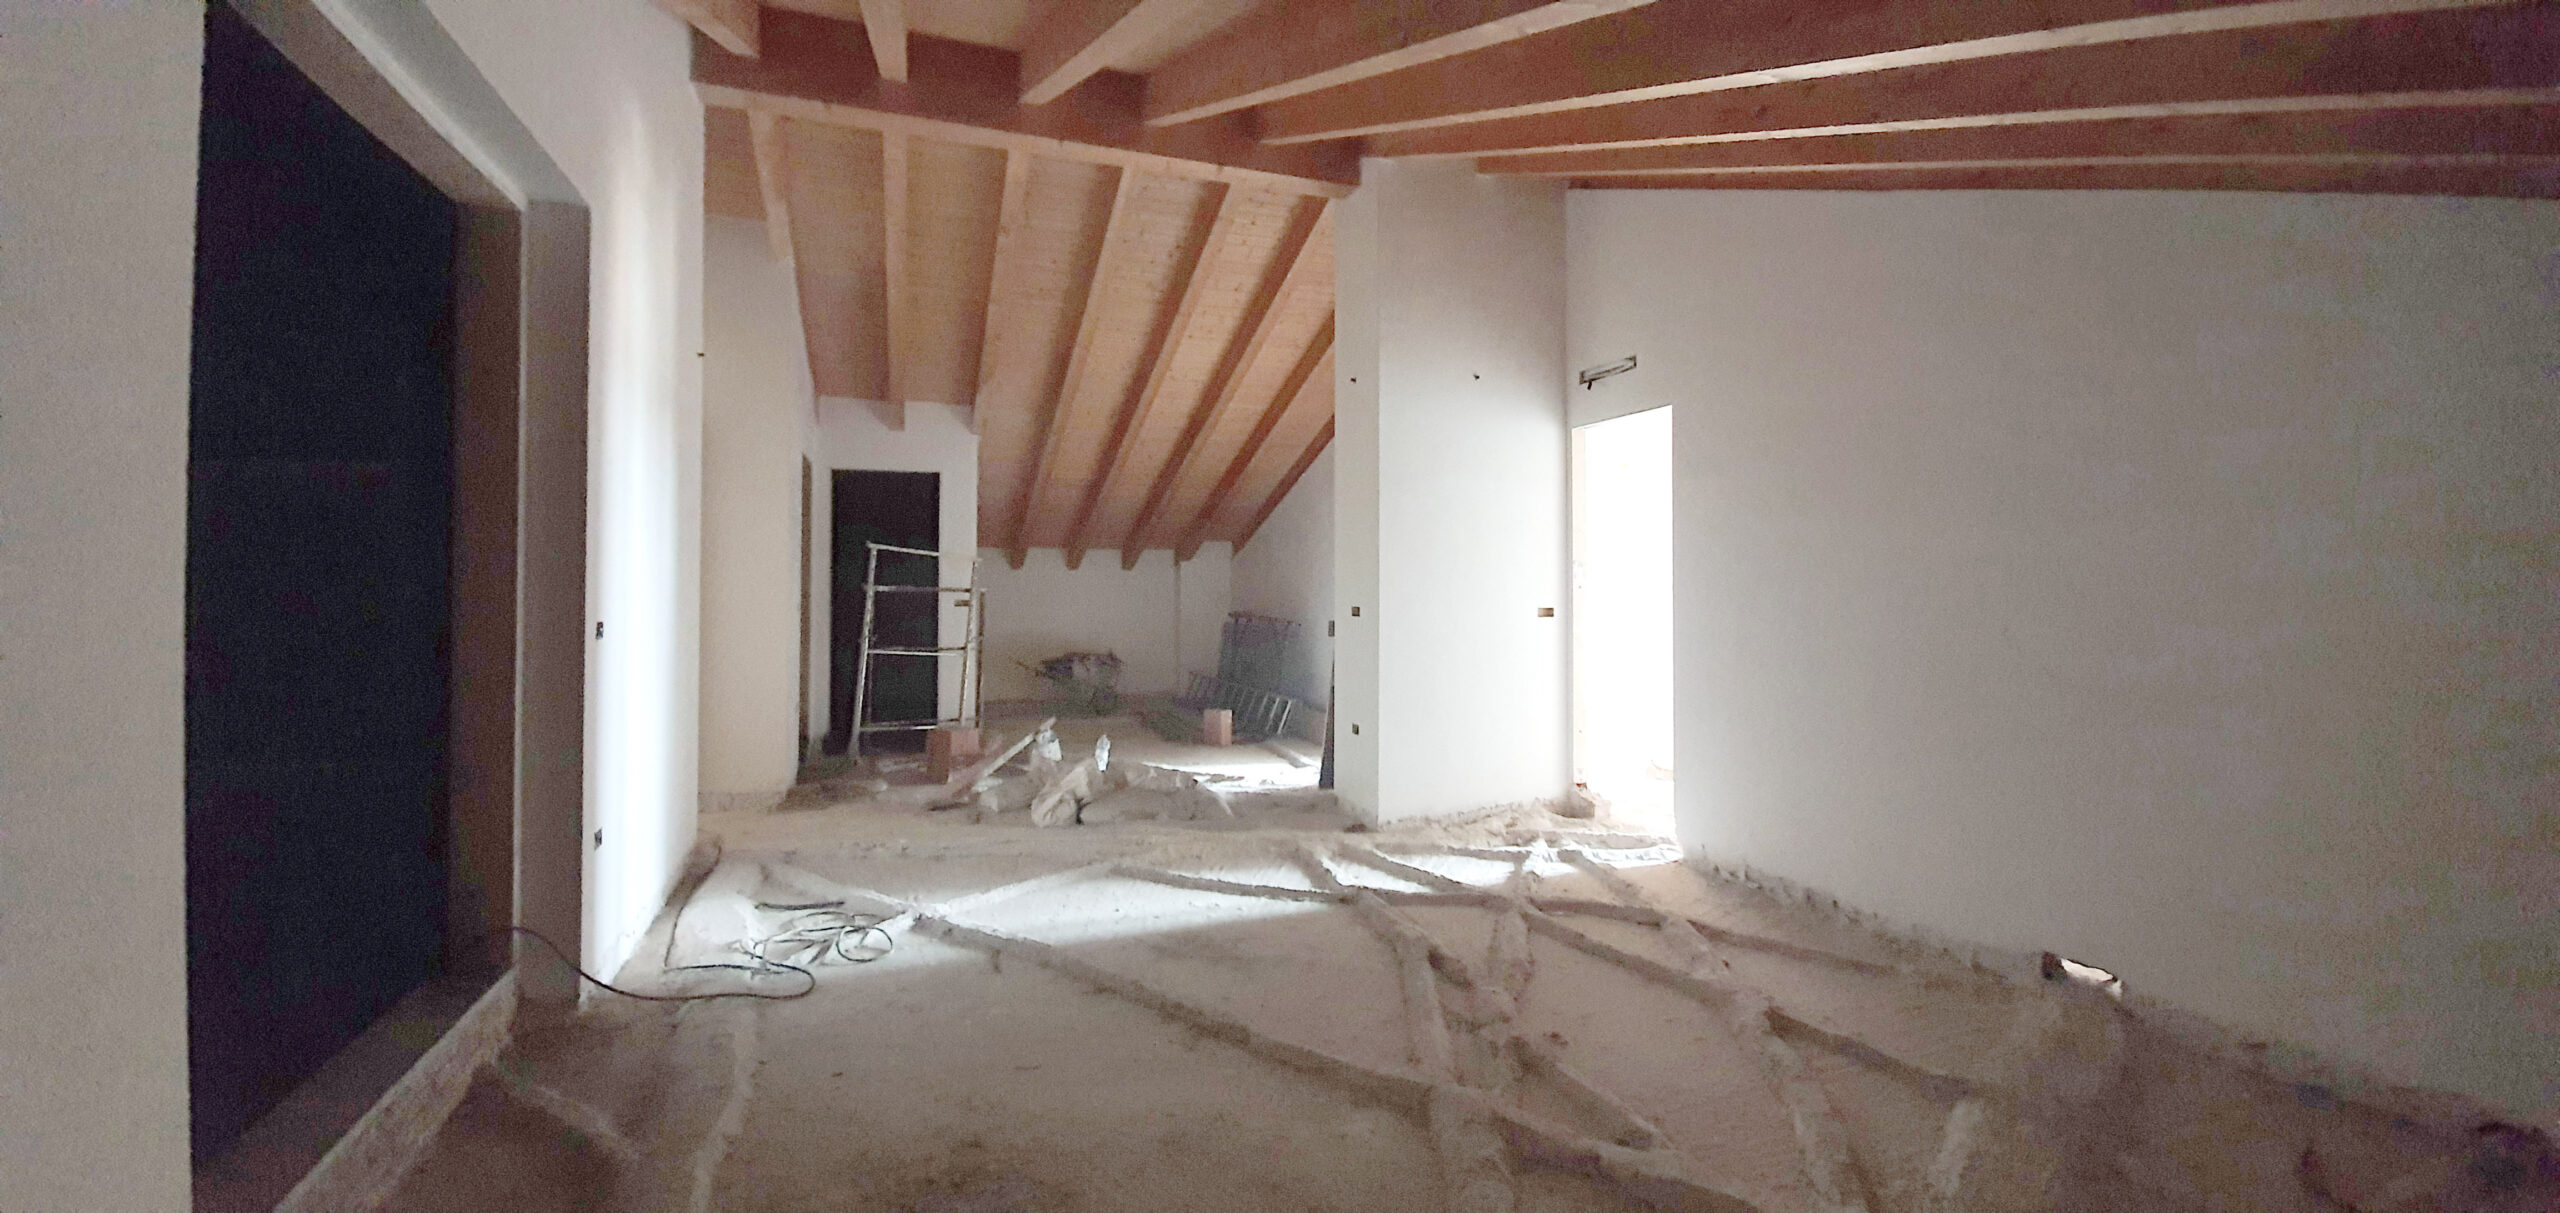 Appartamento in mansarda, in vendita a Dairago